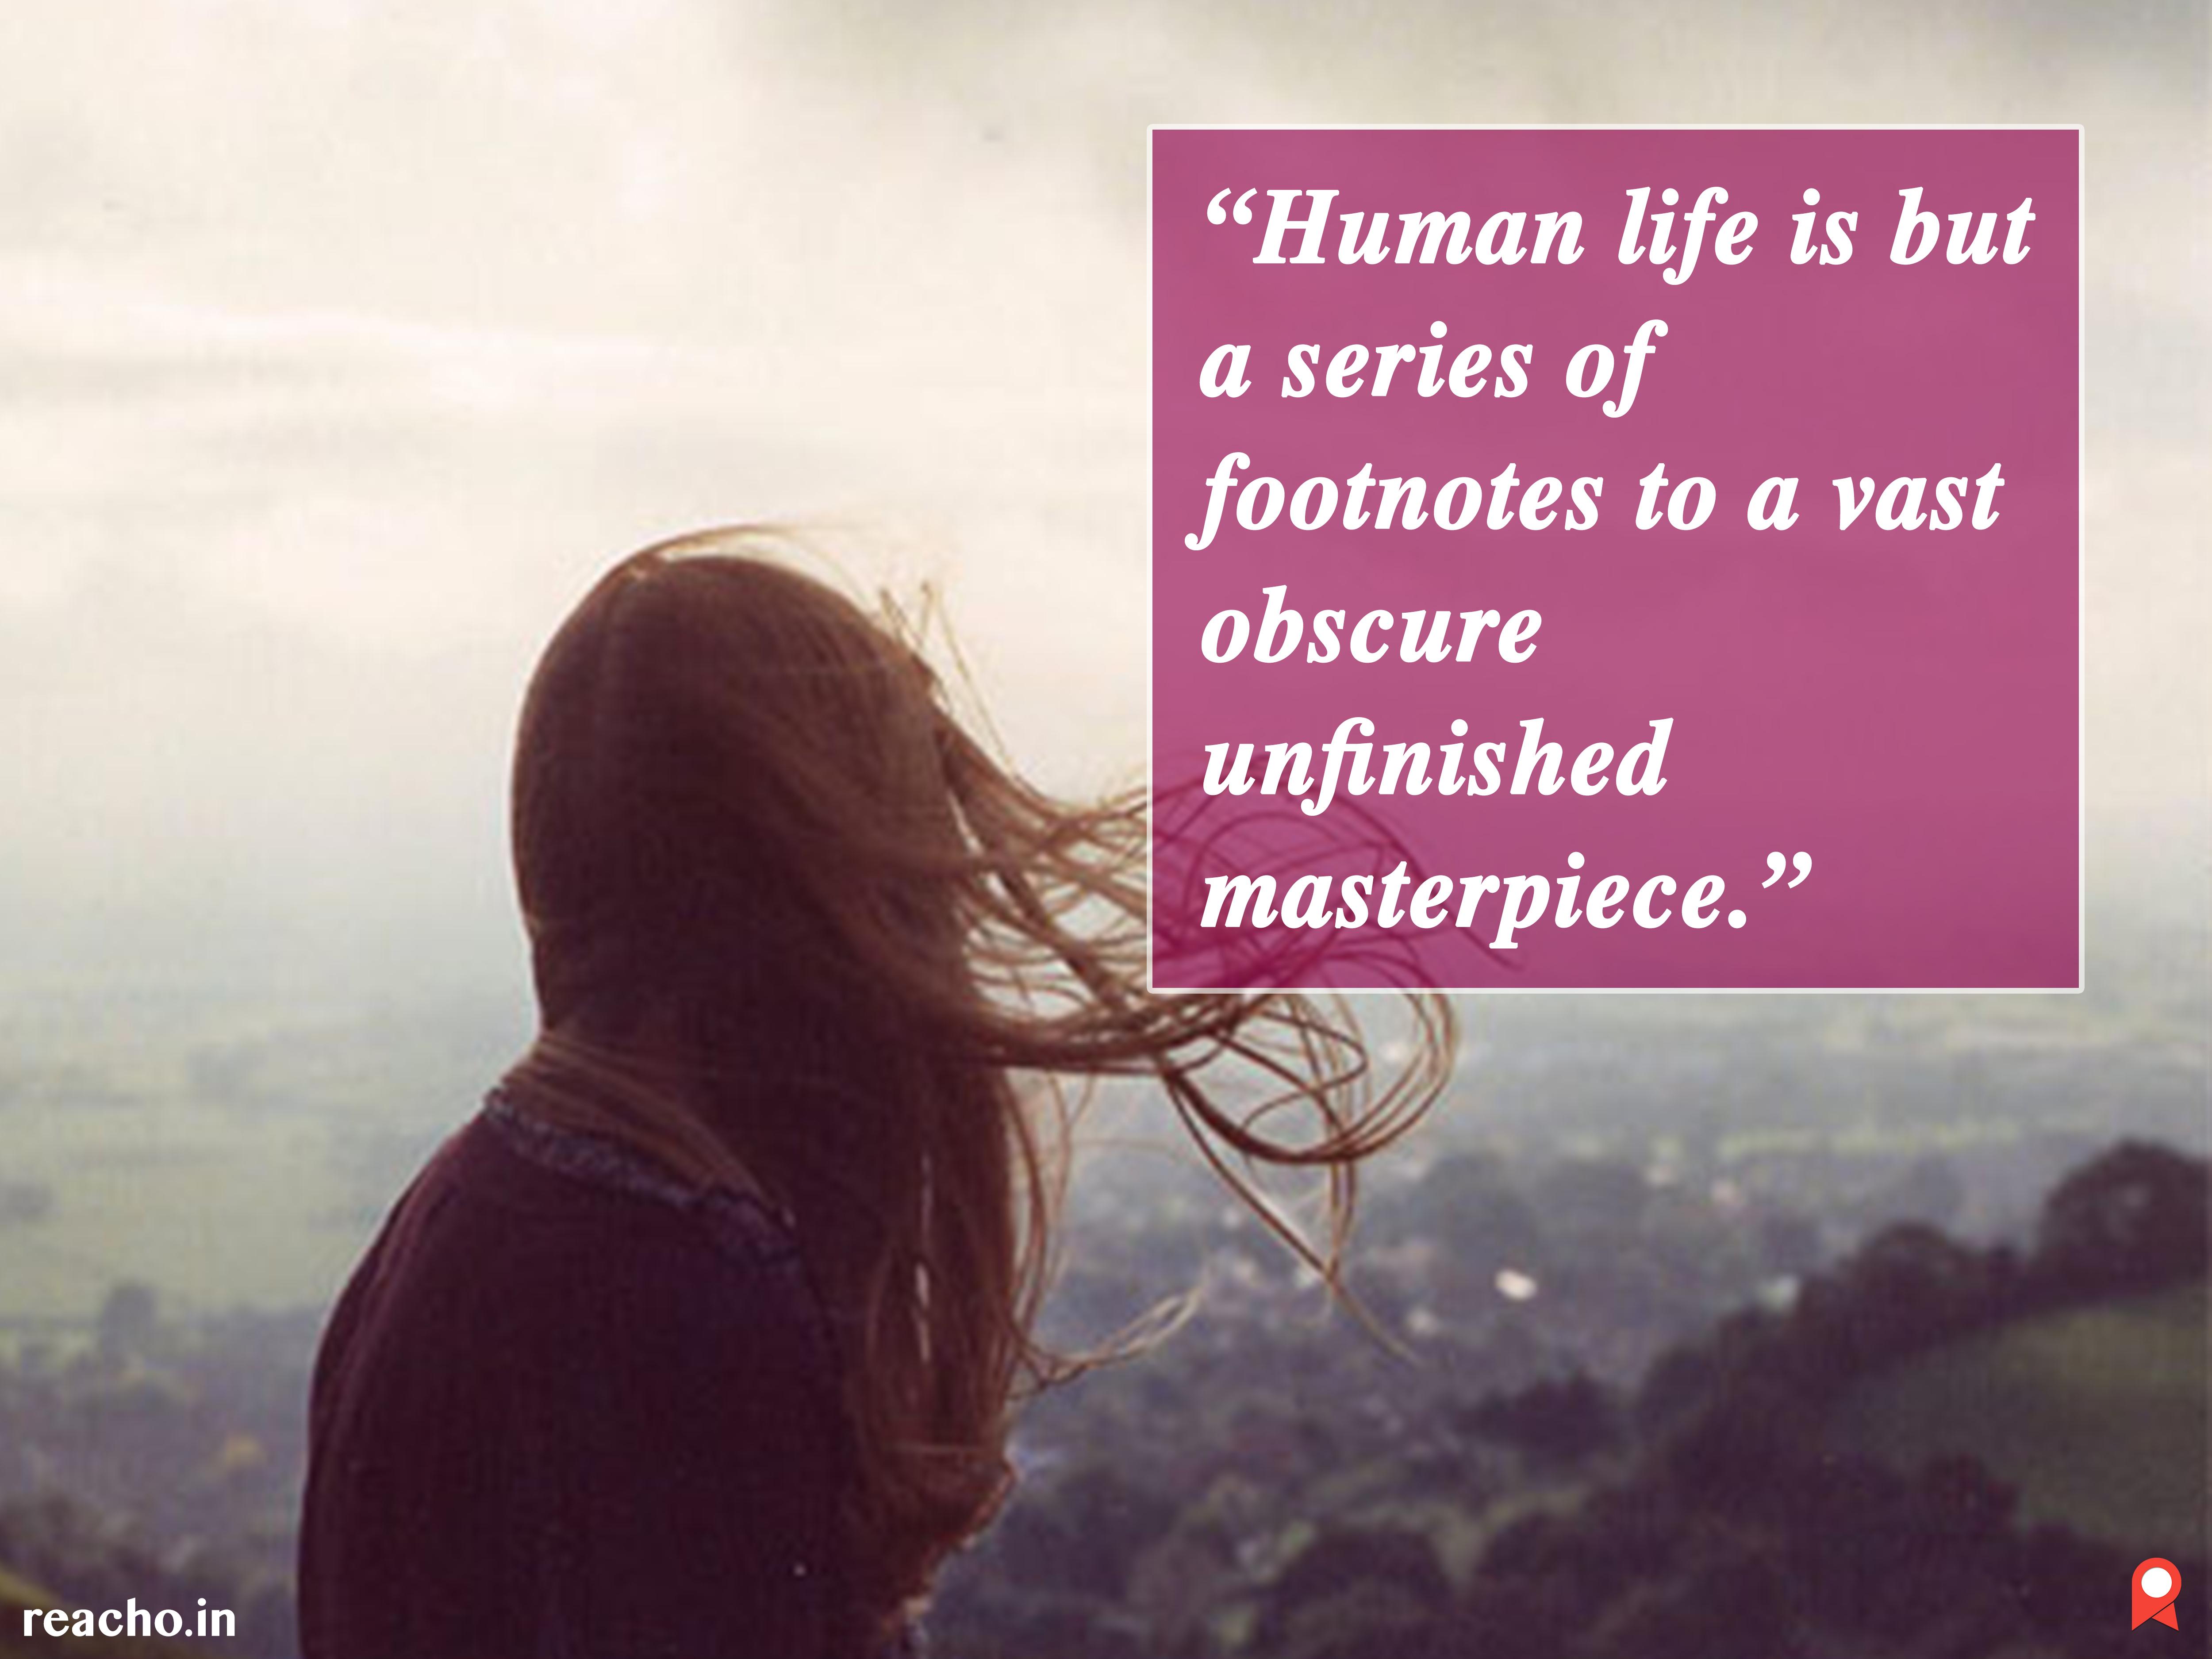 Vladimir Nabokov, Lolita, Dolores, Humbert, adventure, journey, quotes